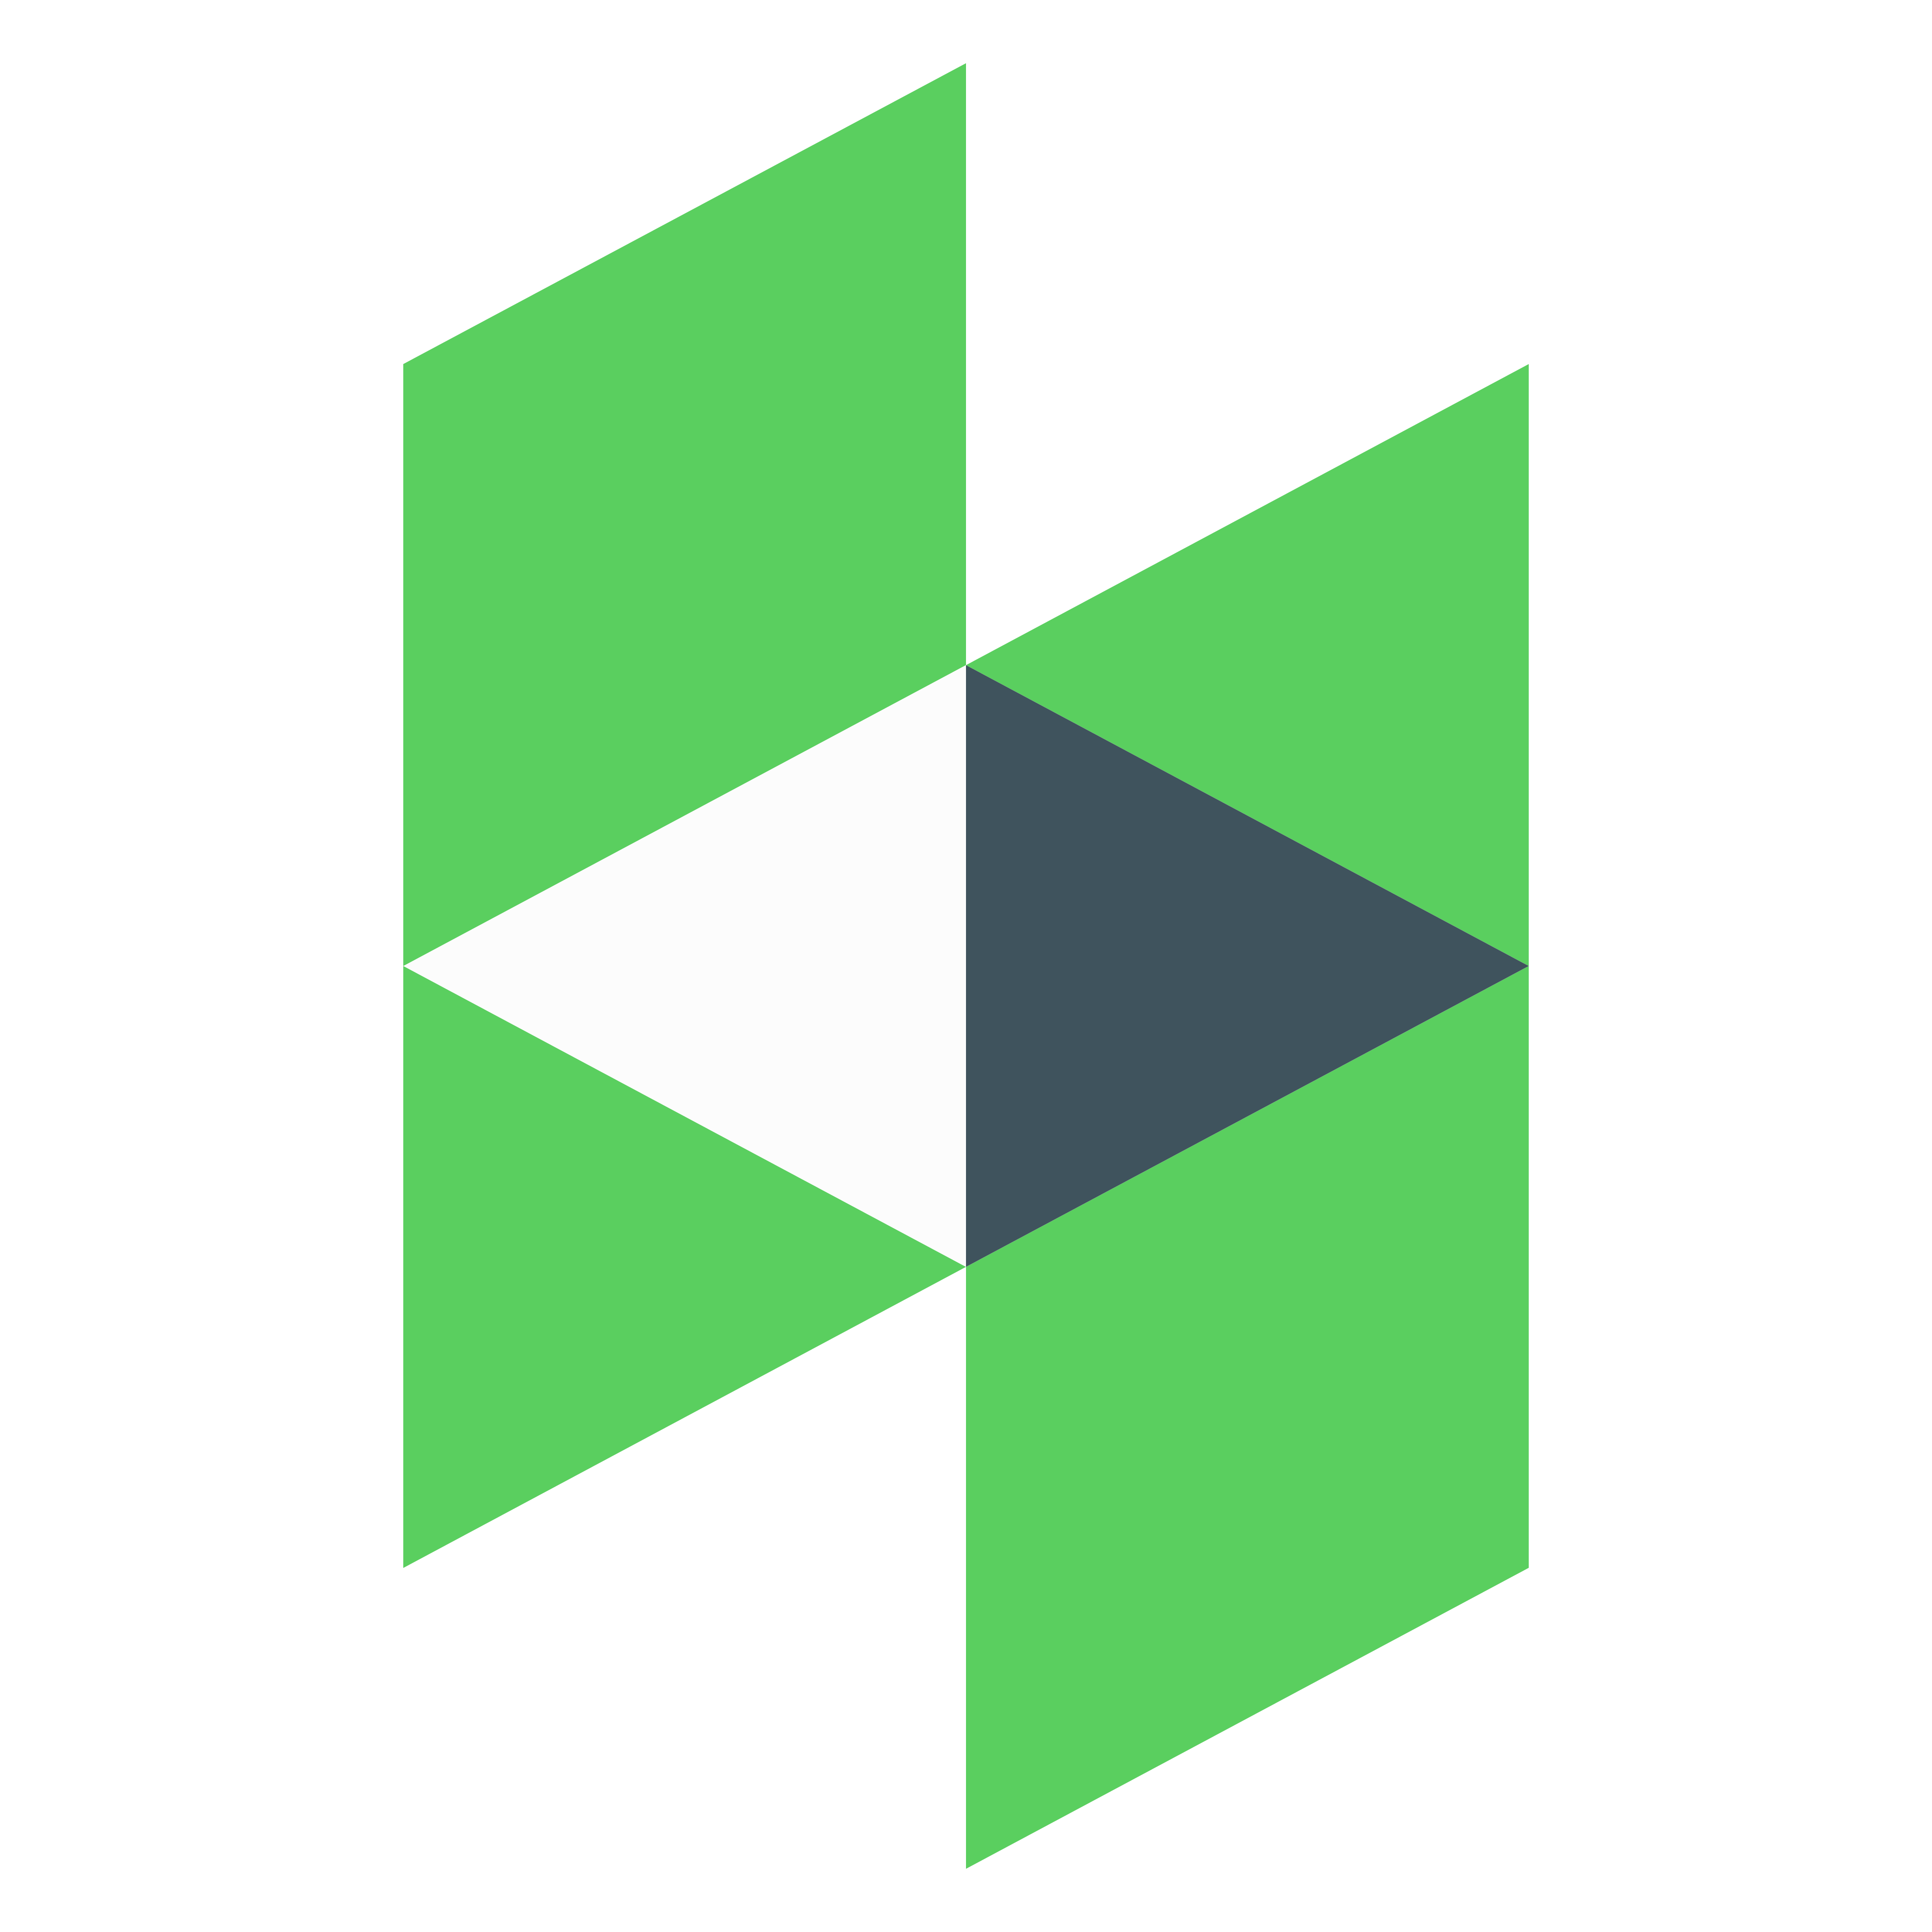 4202124_houzz_logo_social_social media_icon